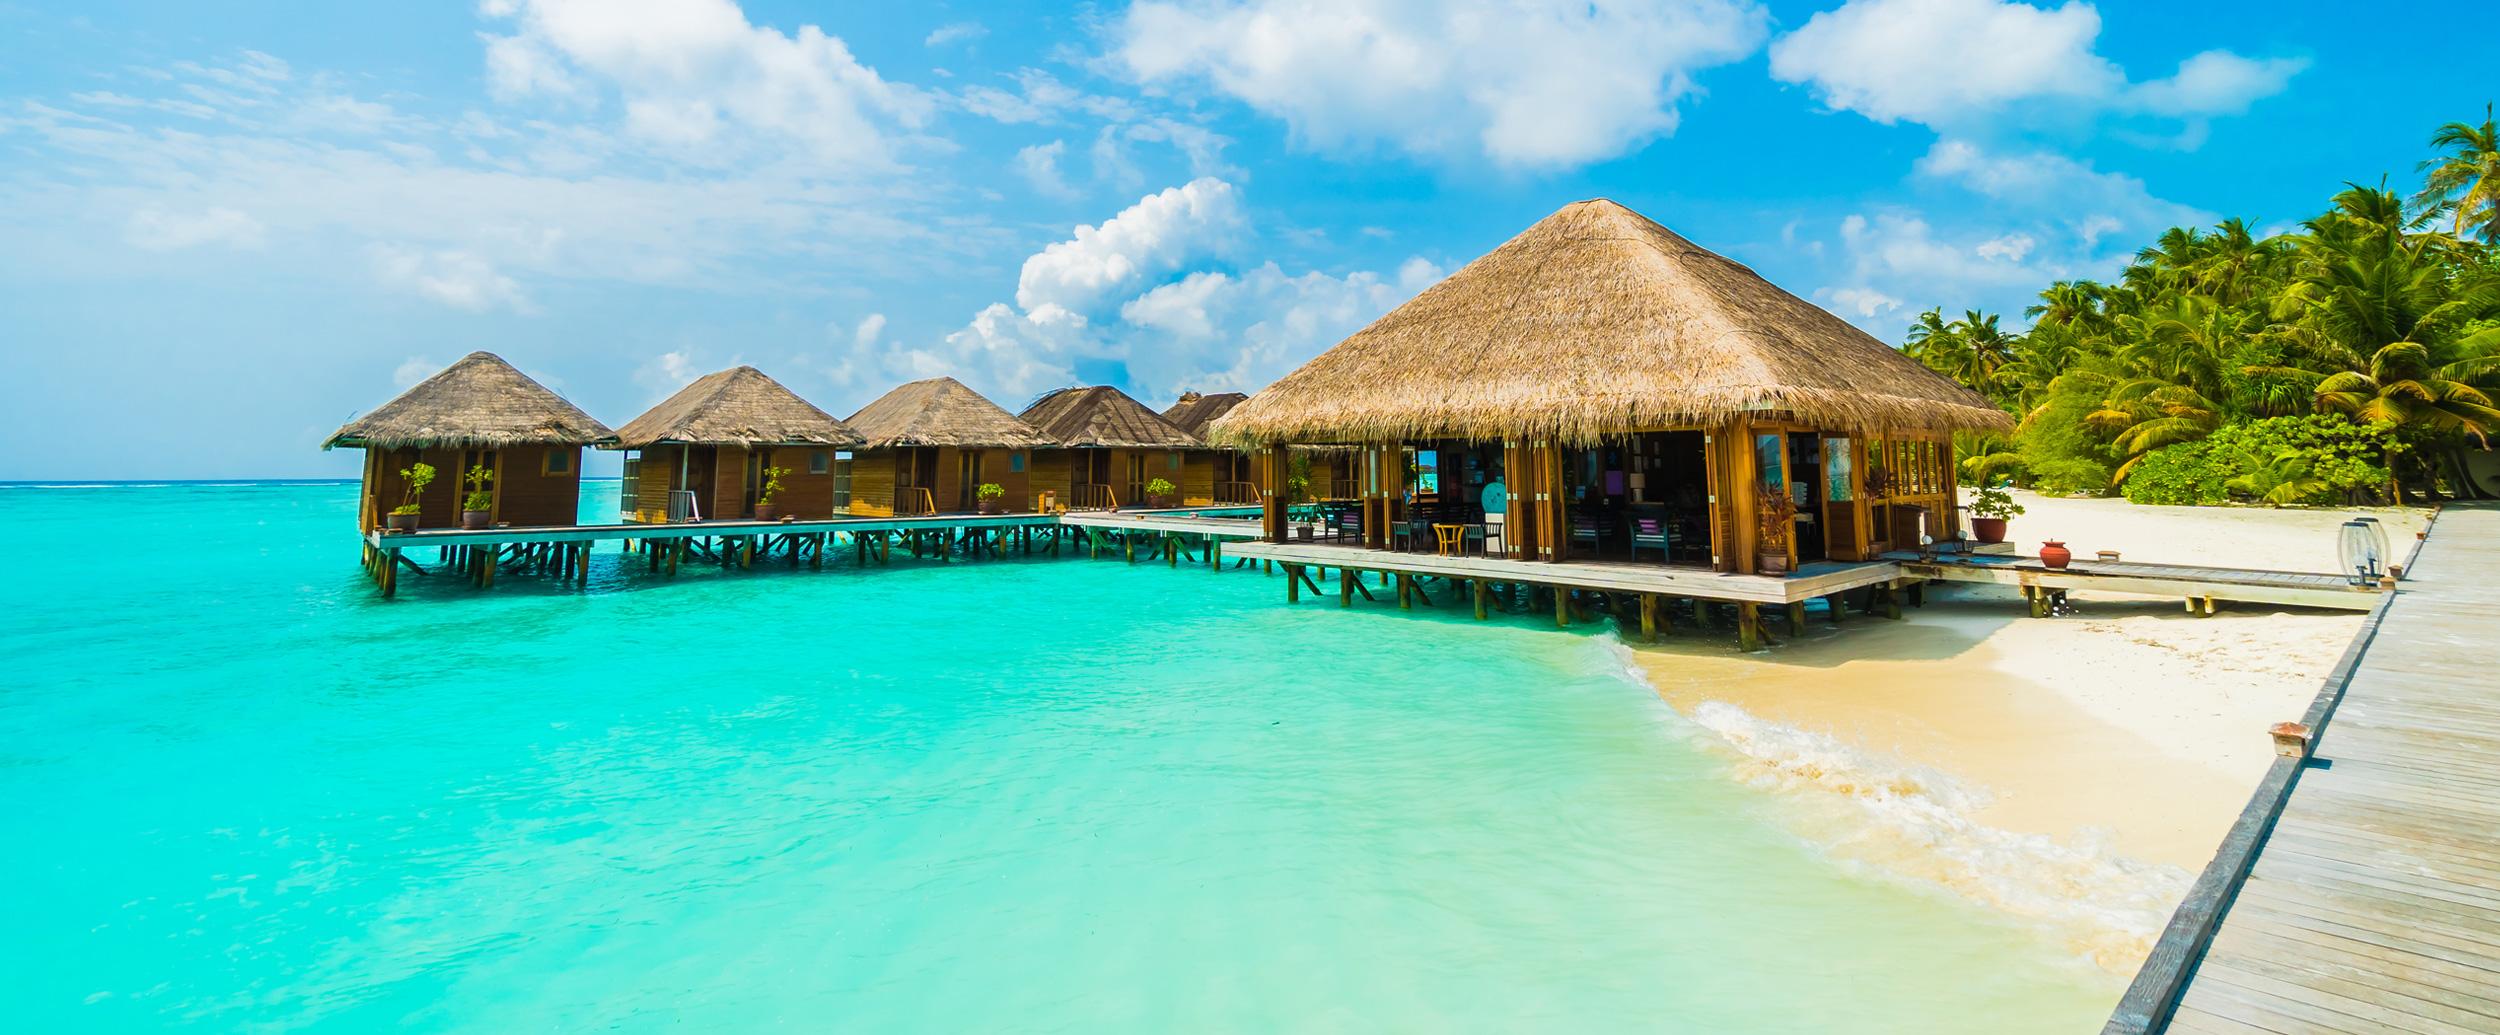 Hotel conrad maldives rangali island 5 ari atoll for Hotel conrad maldives rangali island resort